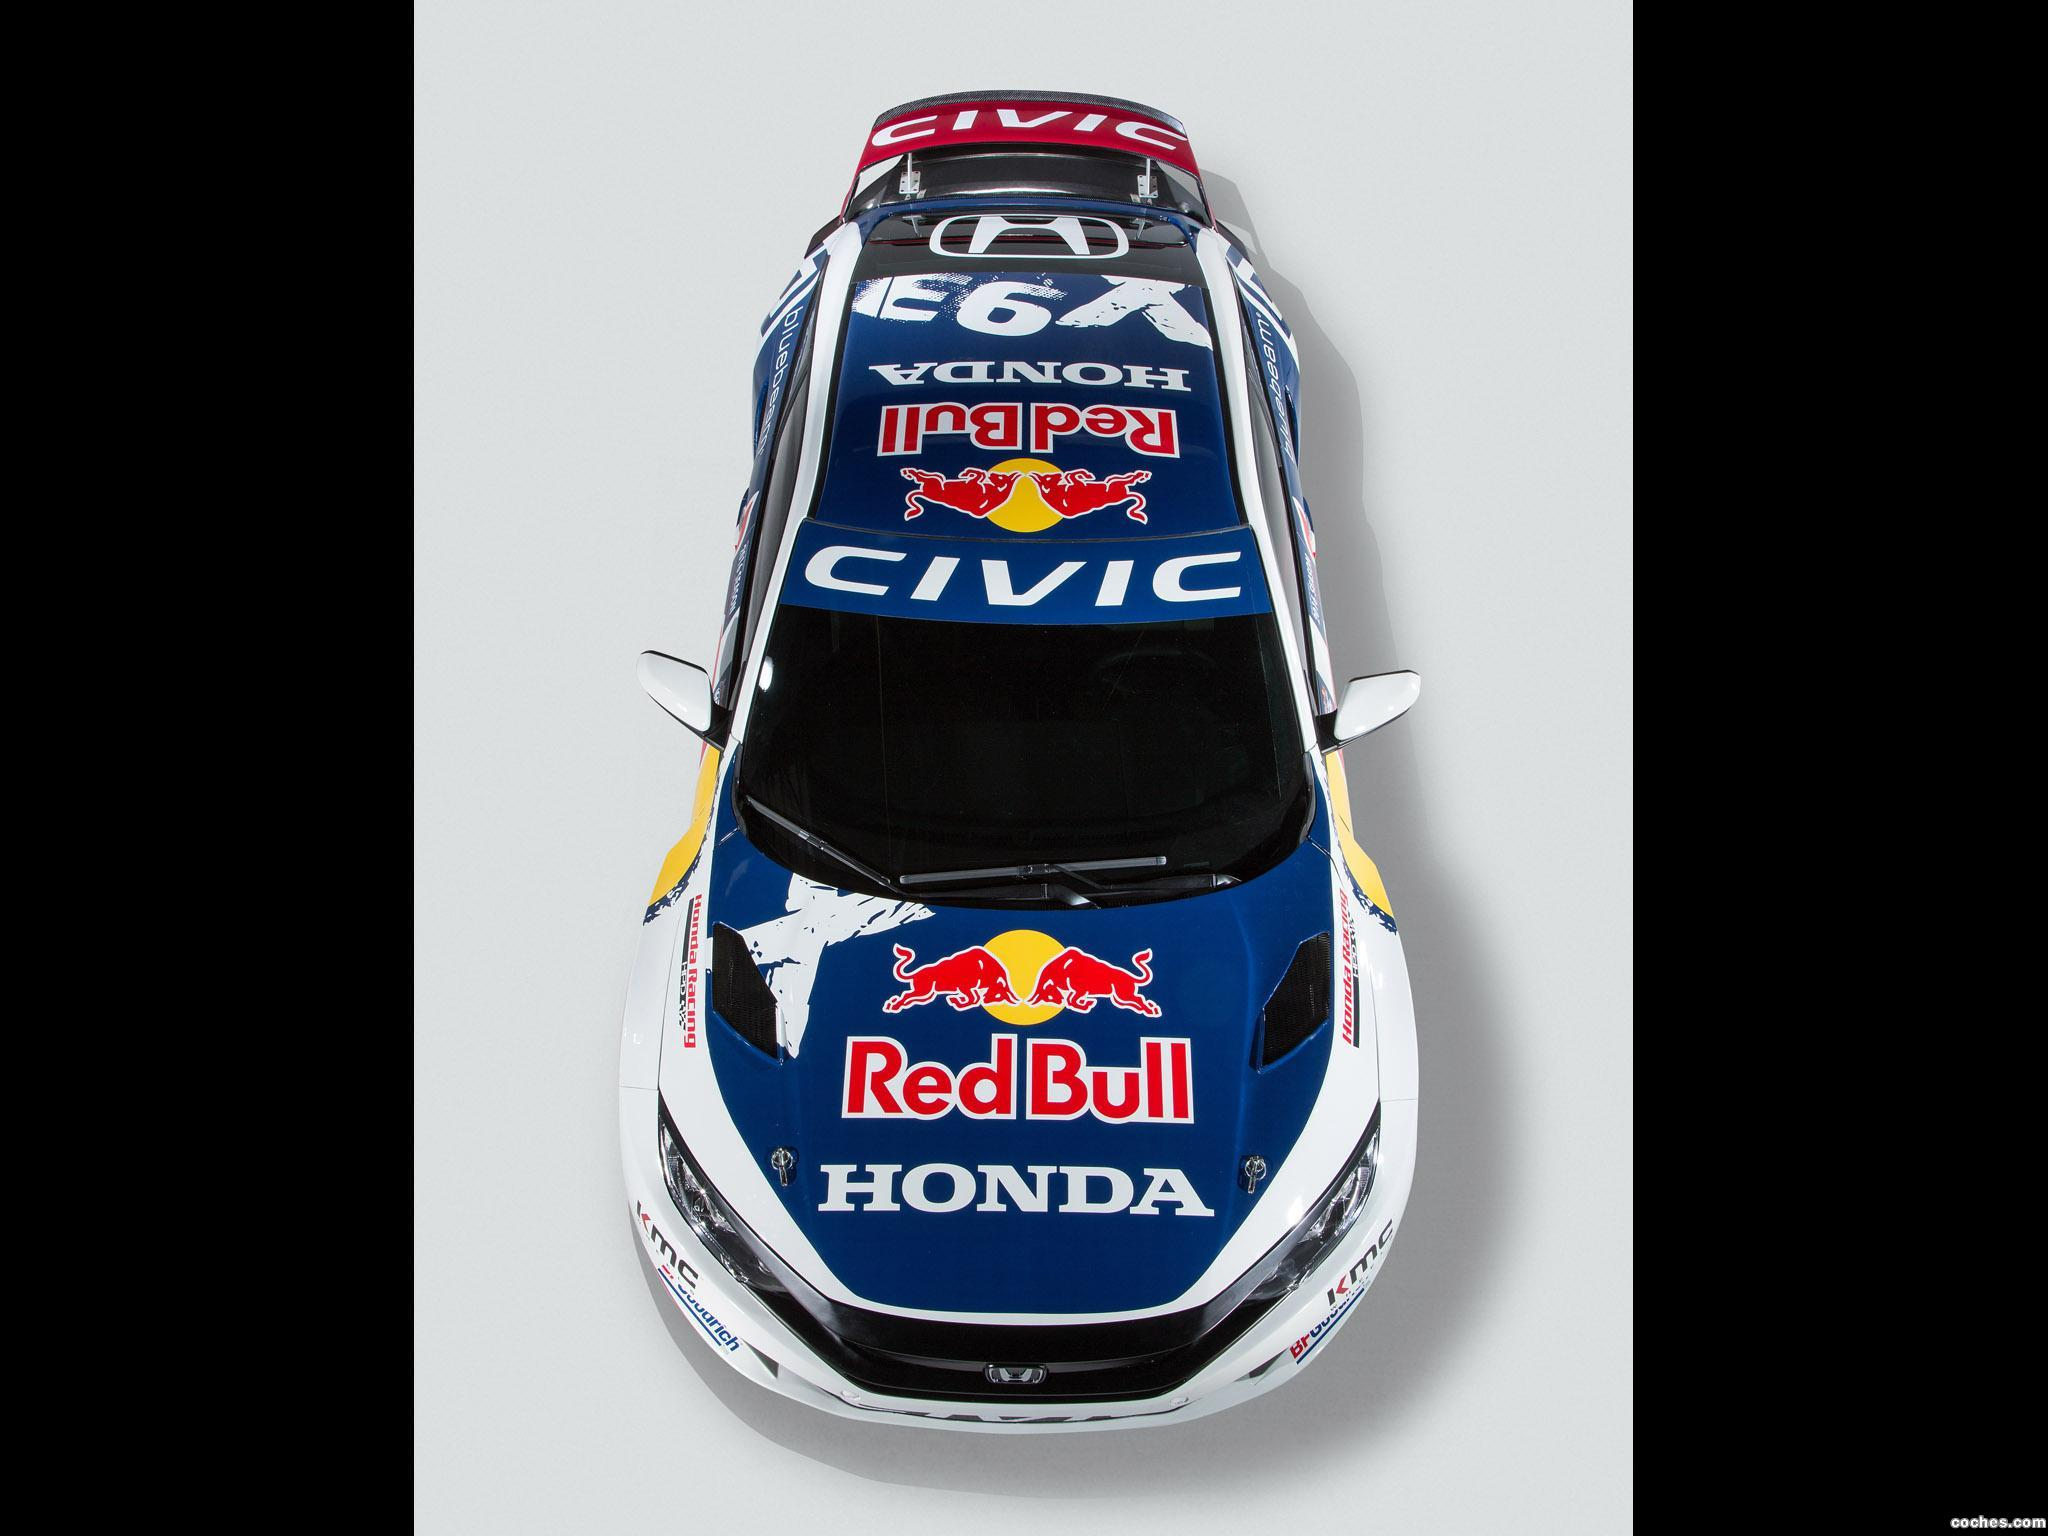 Foto 1 de Honda Civic Coupe Rallycross 2016